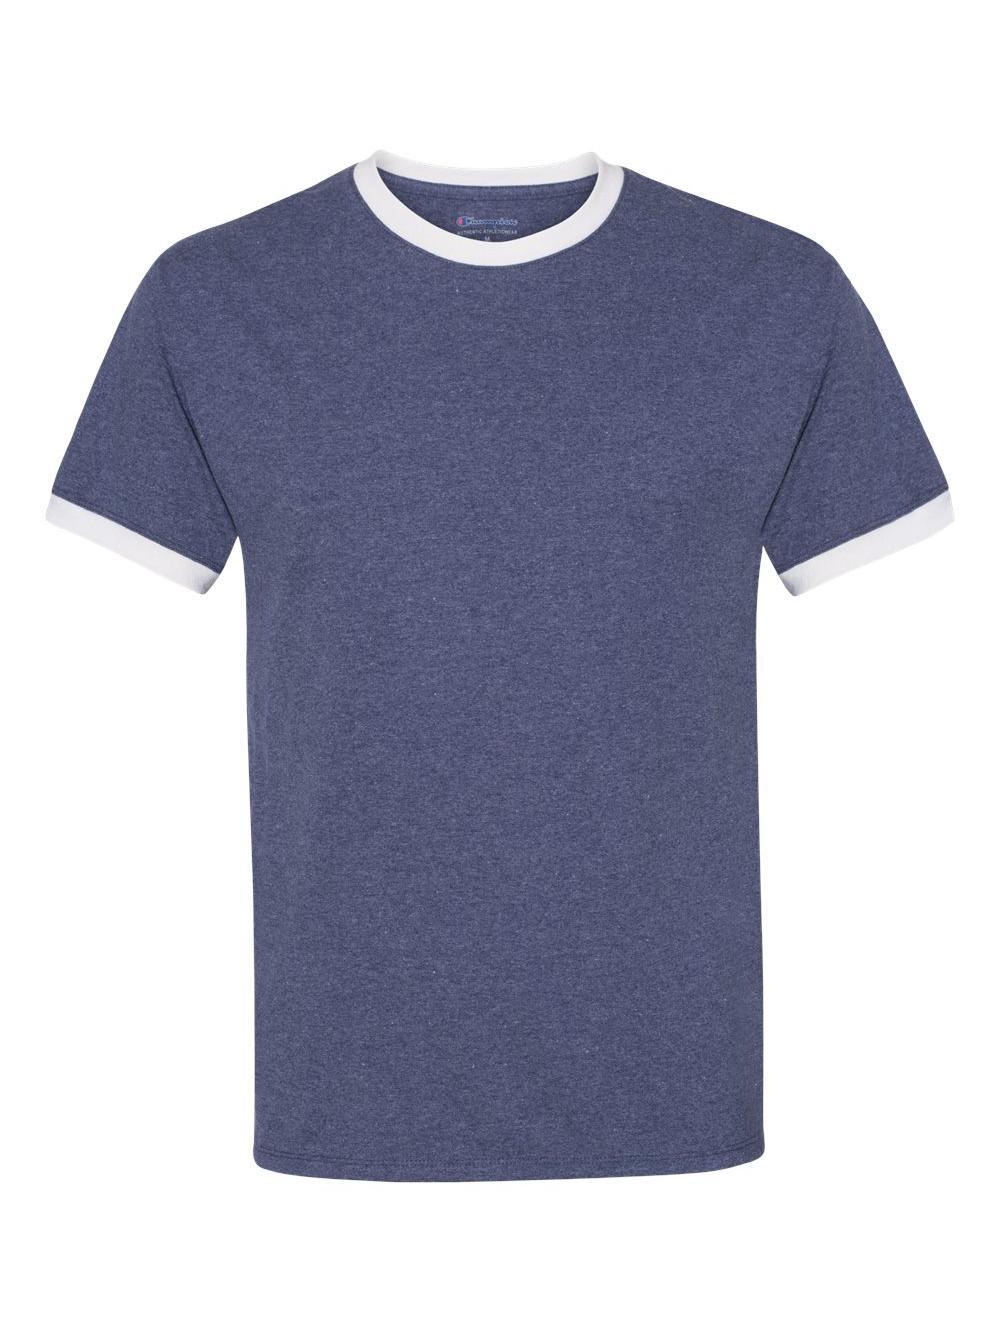 Champion-Premium-Fashion-Ringer-T-Shirt-CP65 thumbnail 17